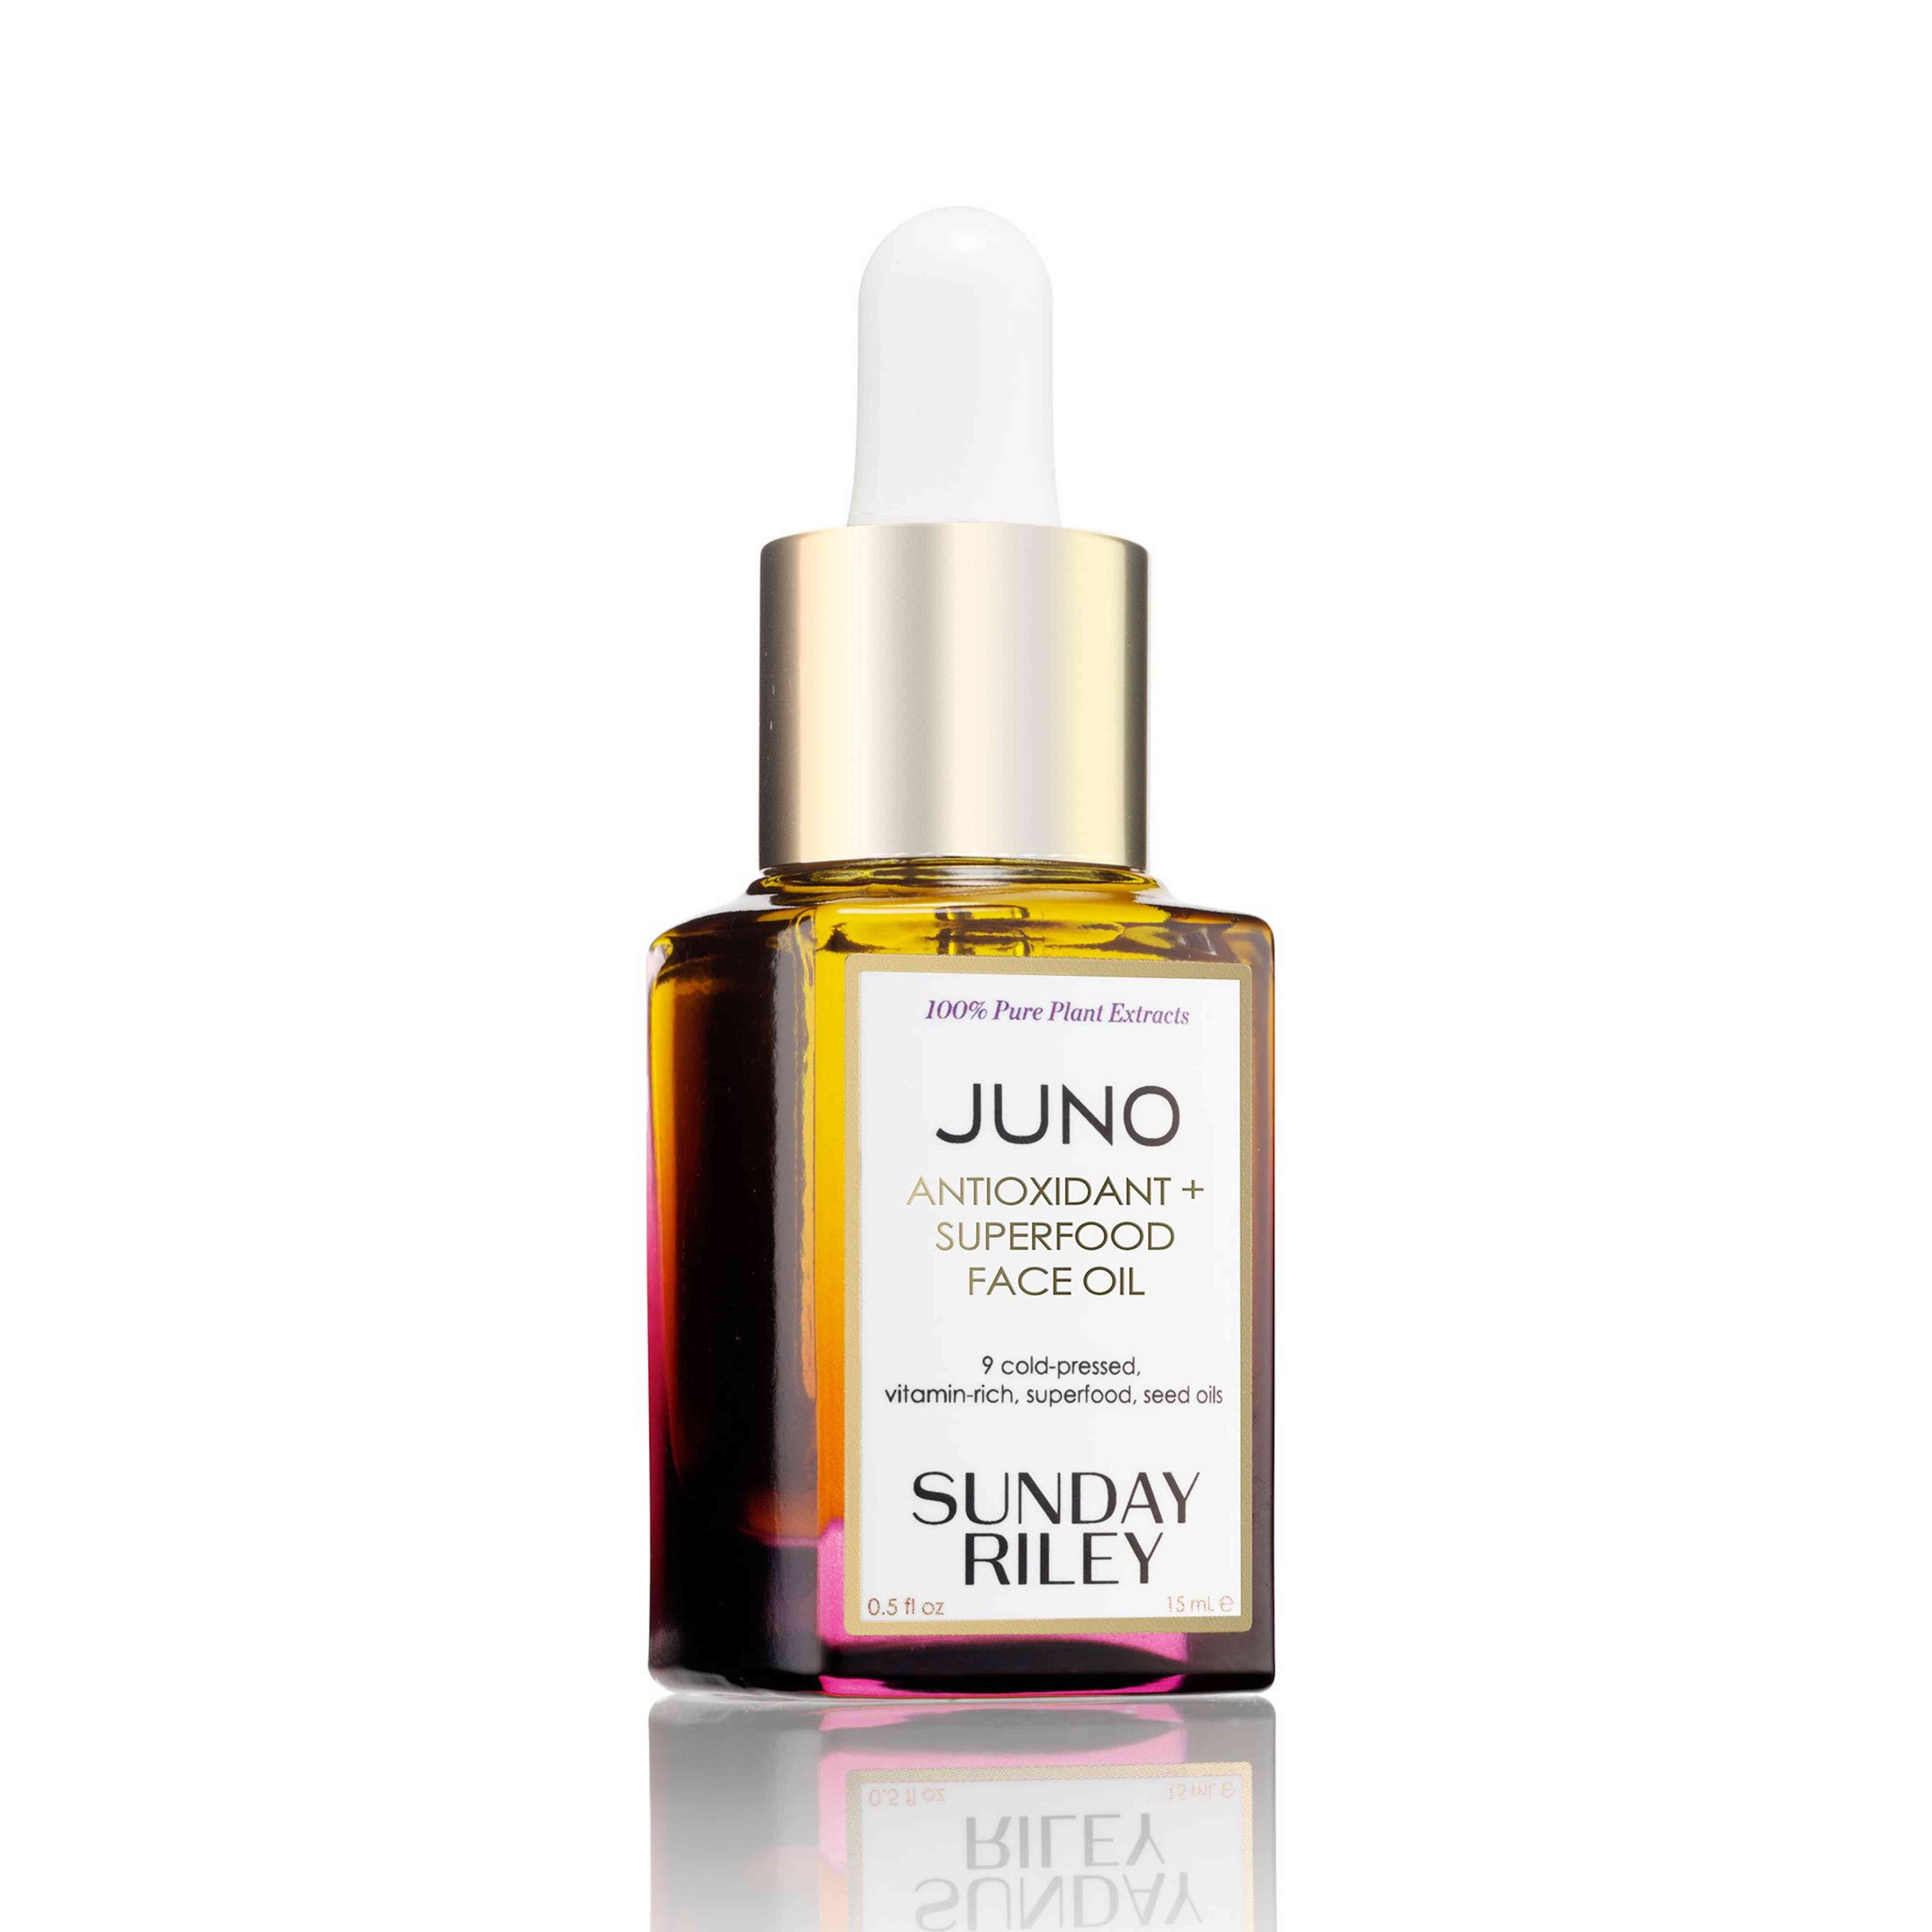 Sunday Riley Juno Antioxidant + Superfood Face Oil